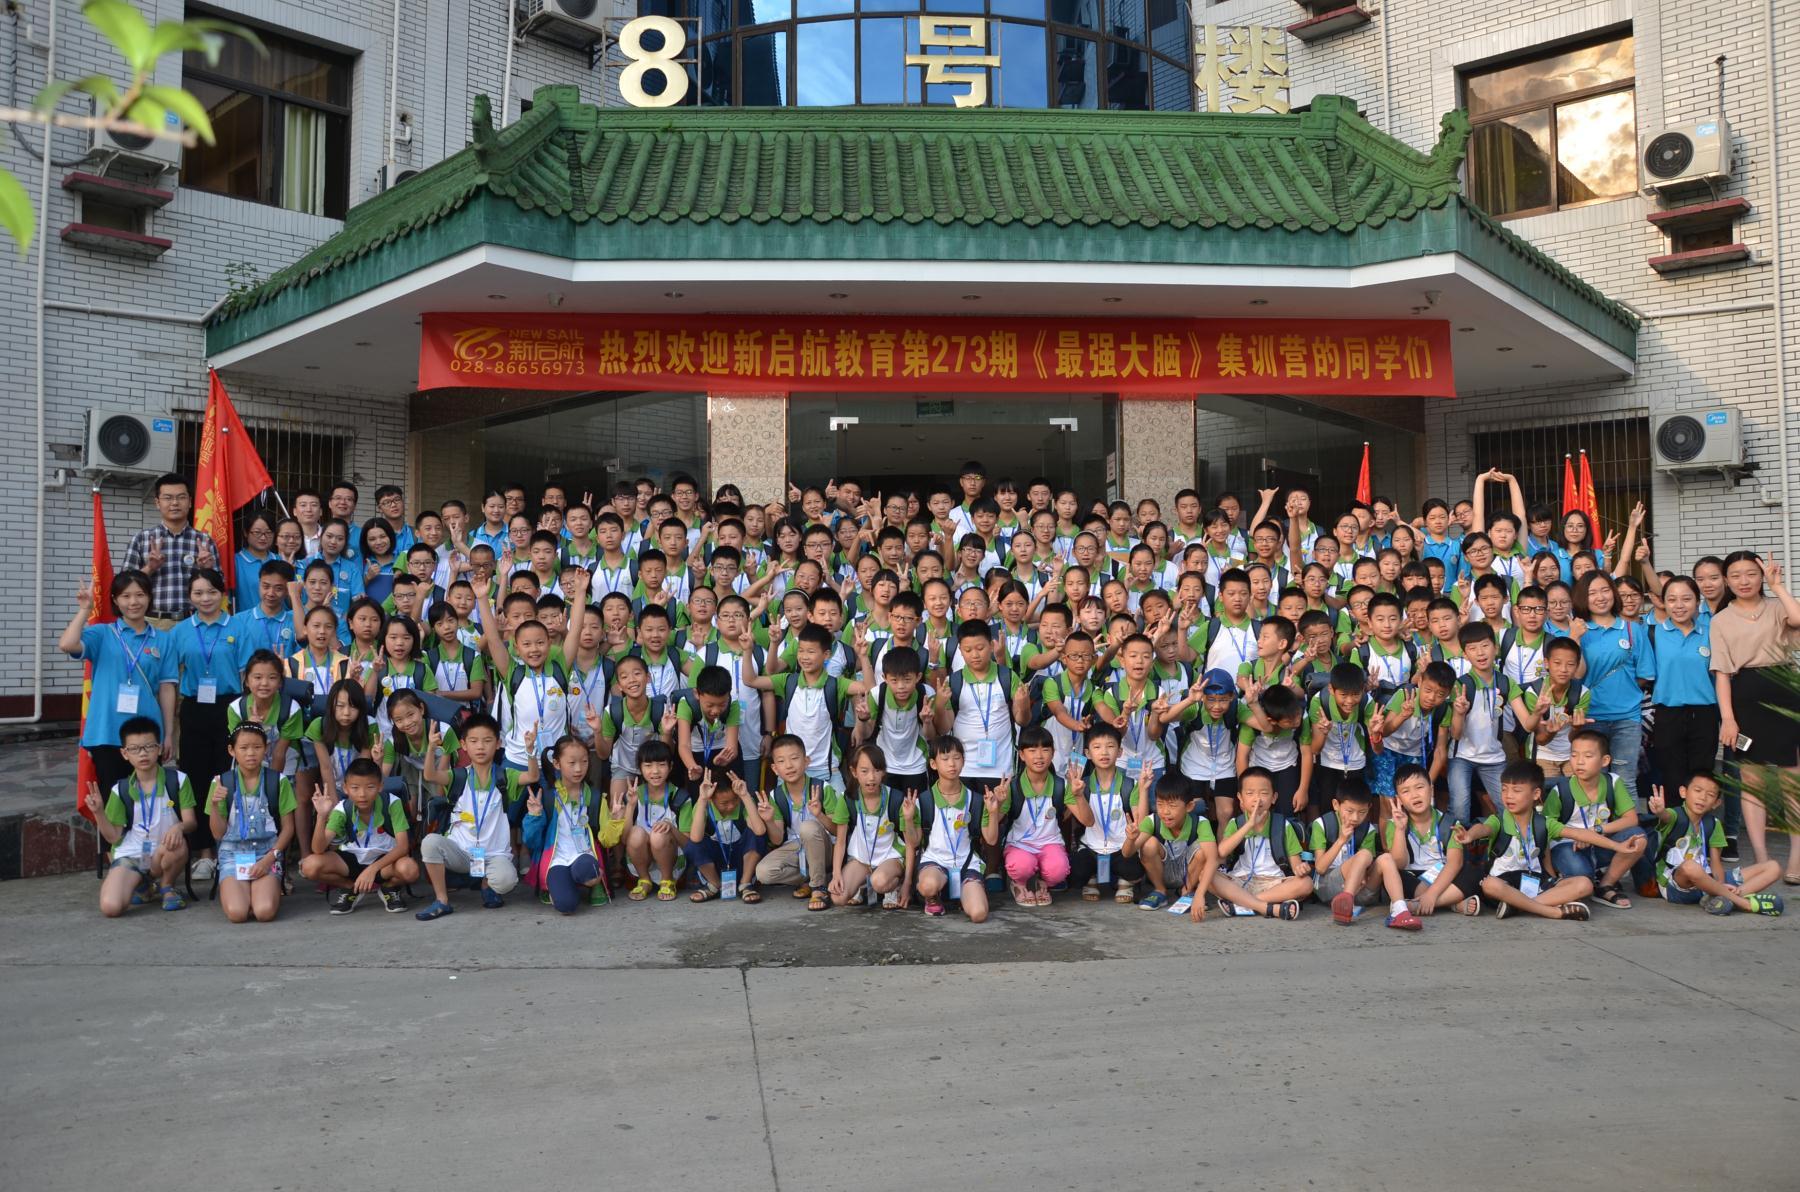 <b>新启航教育成都2017年7月19-26日第273期集训营</b>